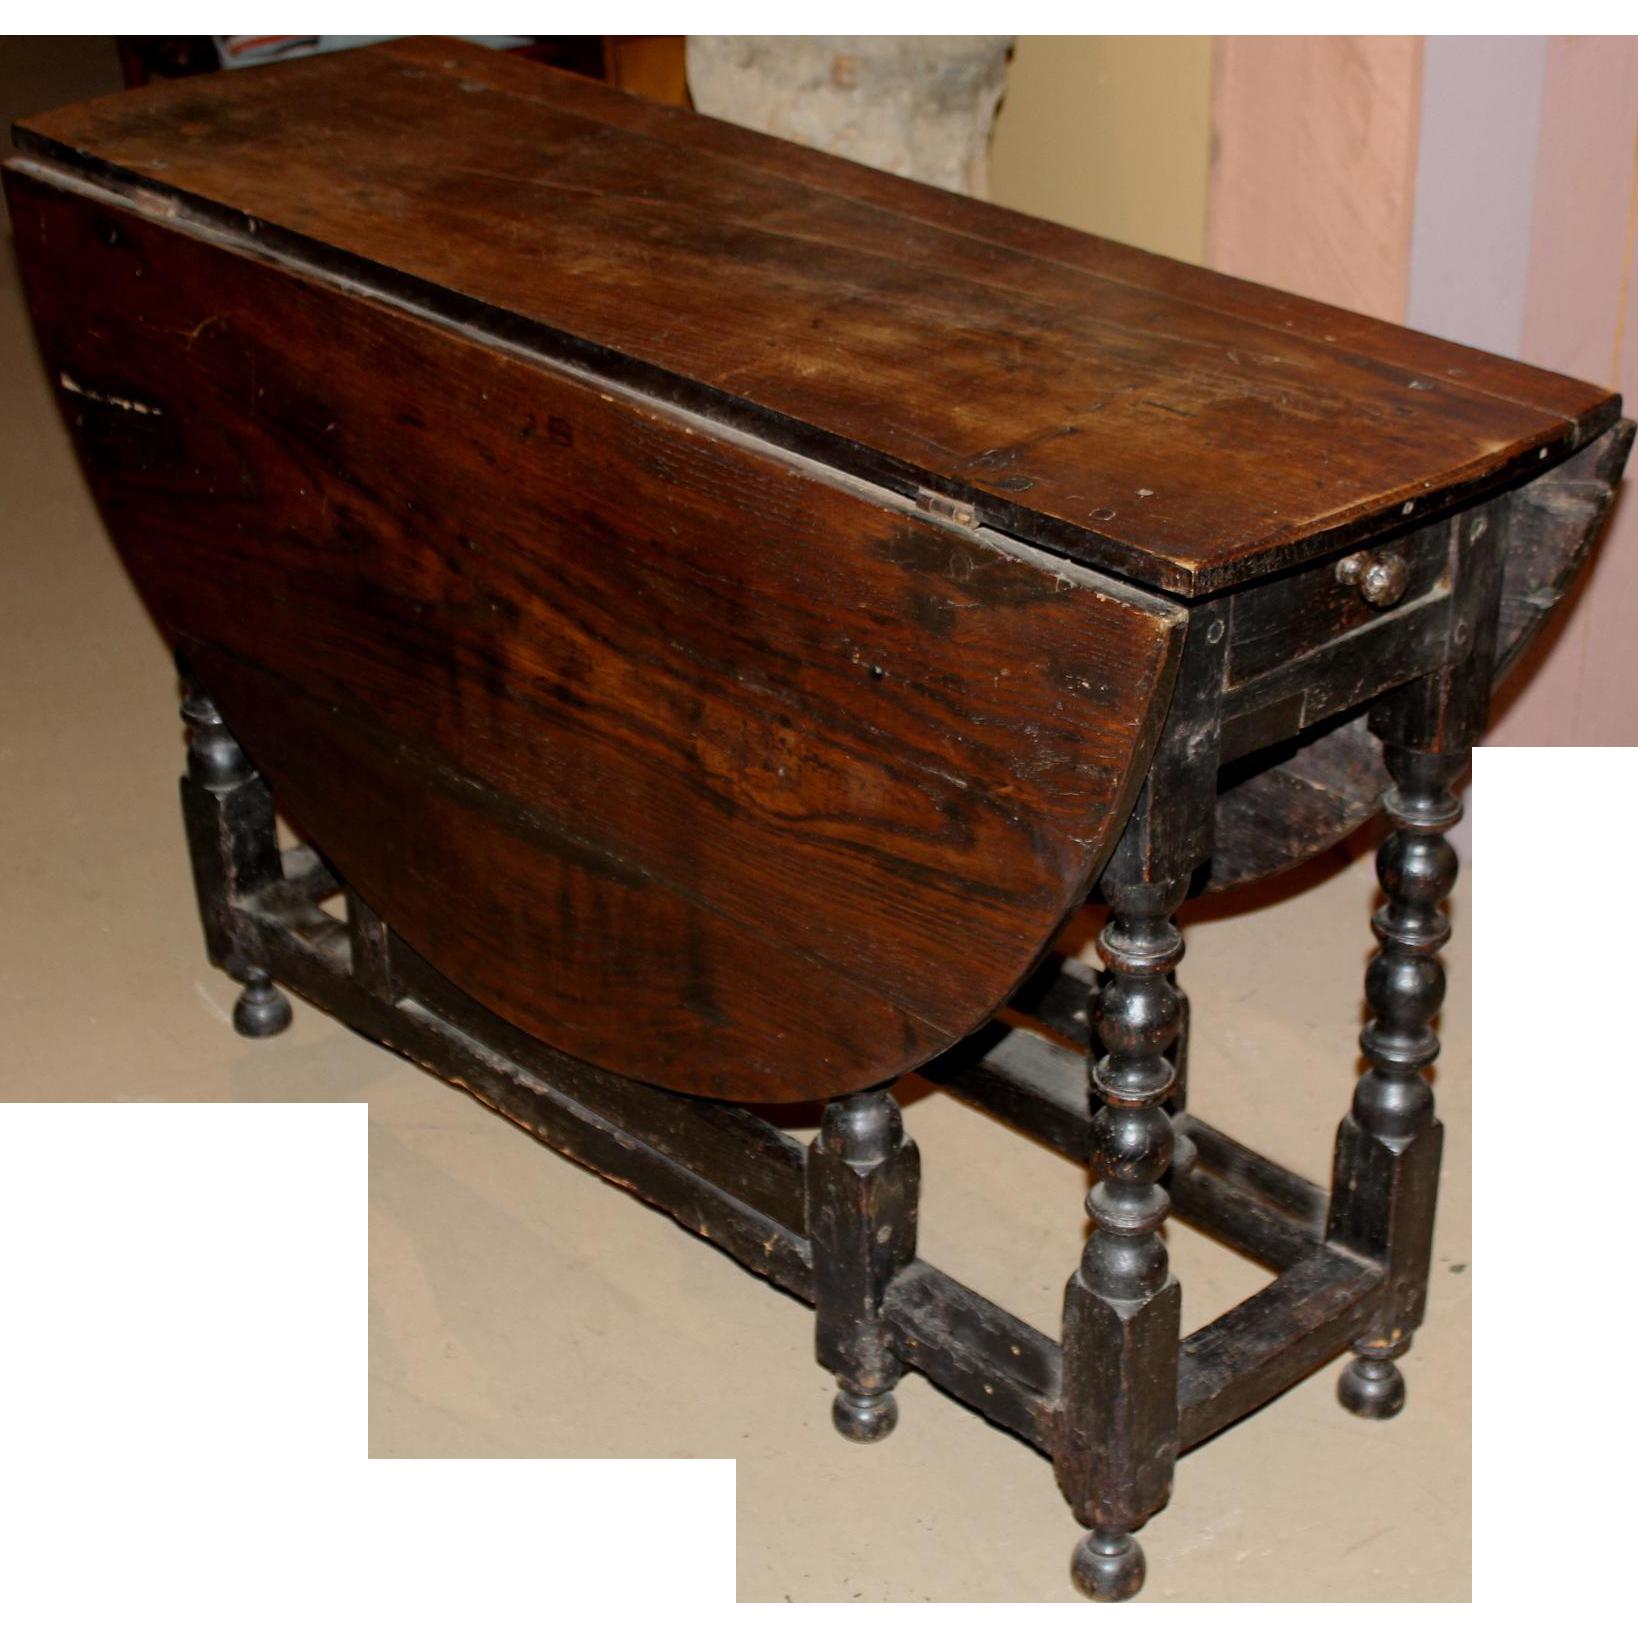 18th / 19th c English Oak Oval Gate Leg Table